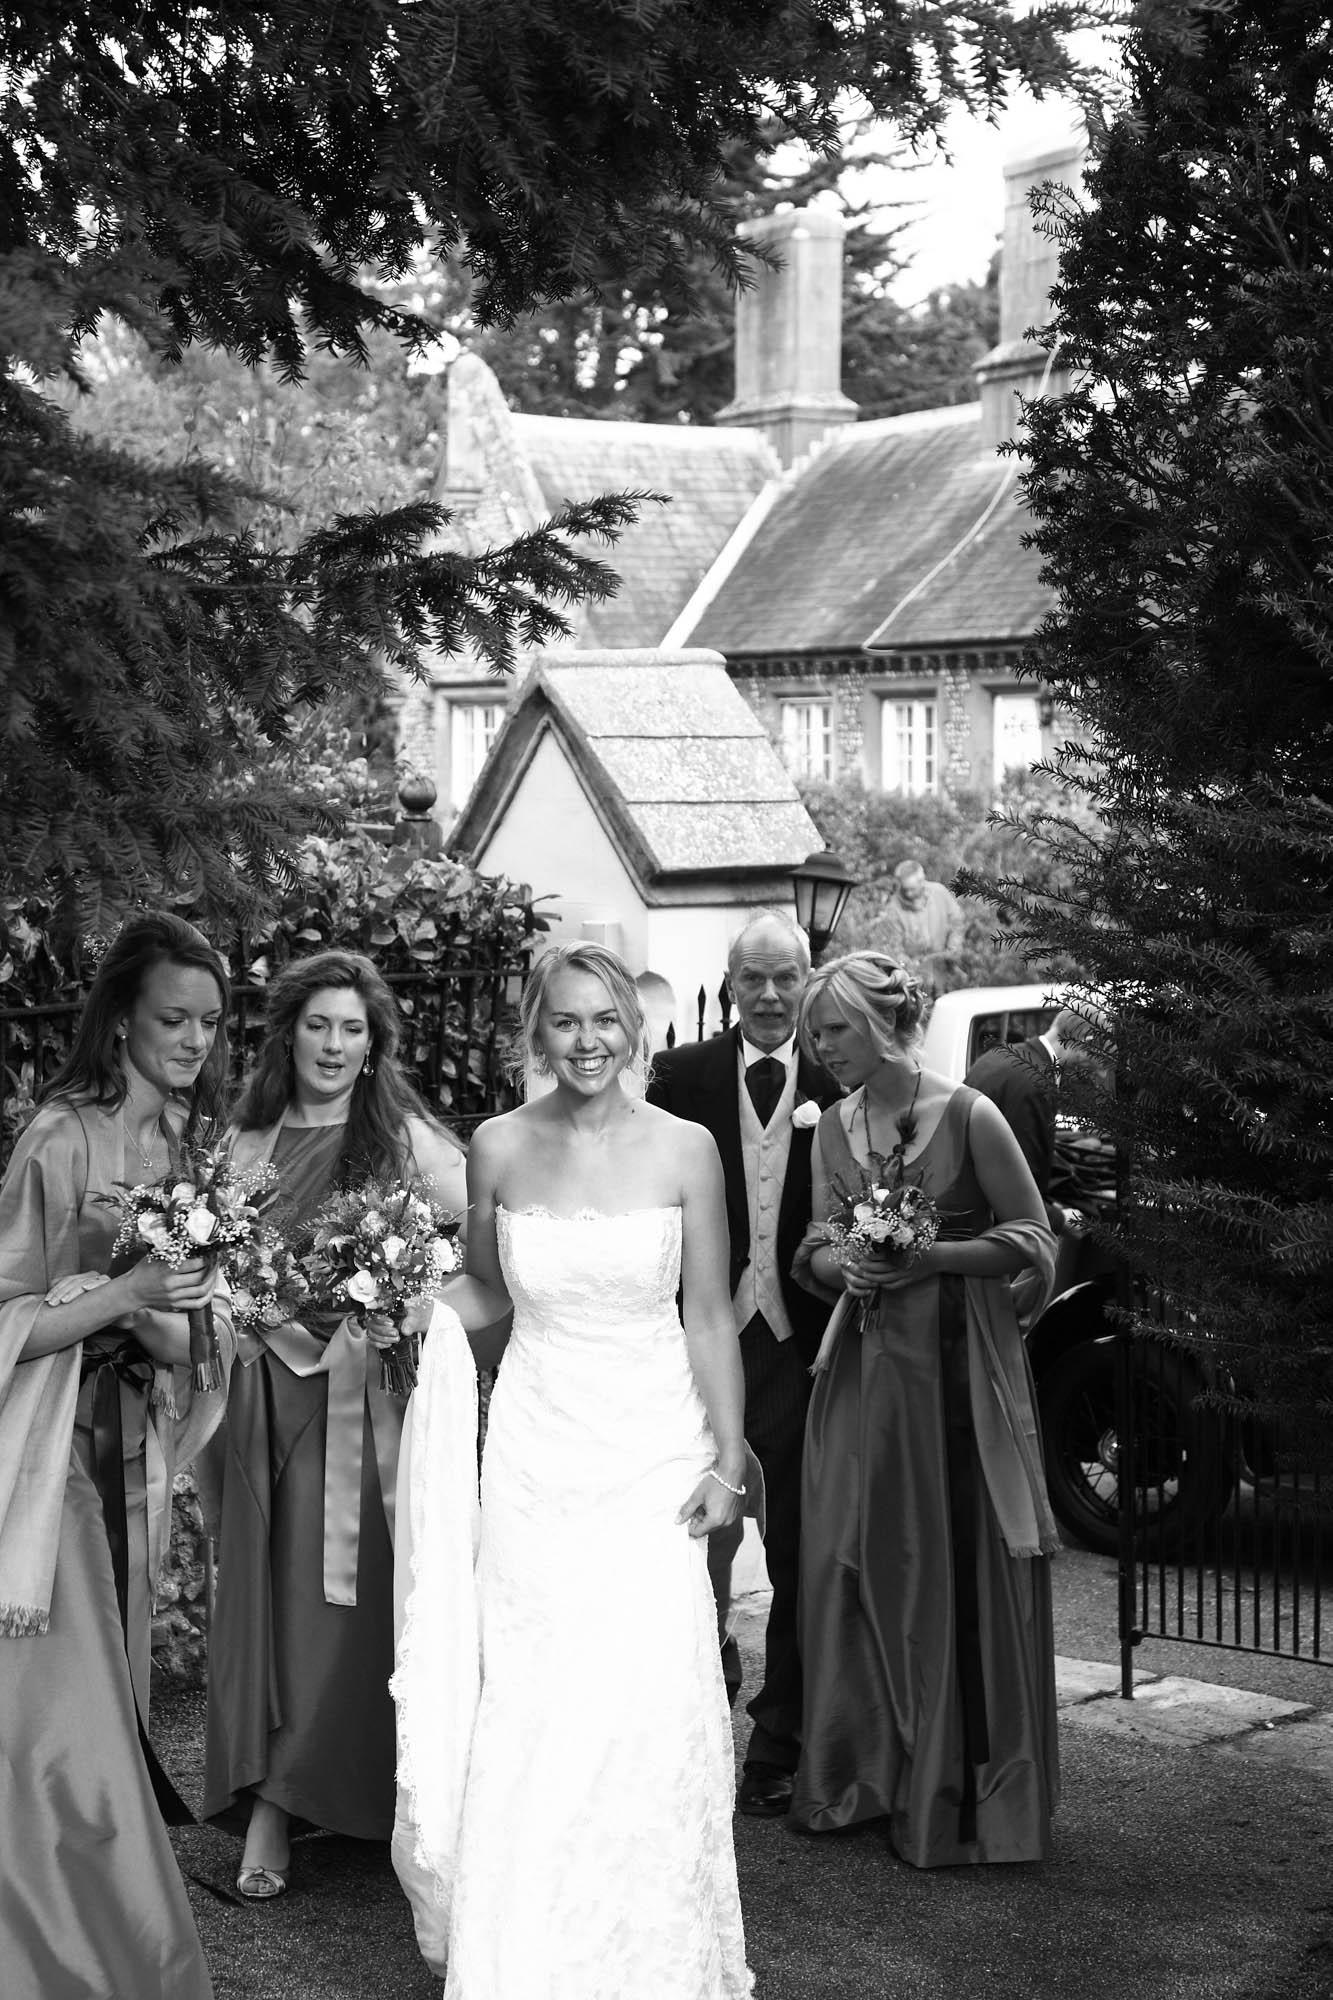 weddings-couples-love-photographer-oxford-london-jonathan-self-photography-19.jpg